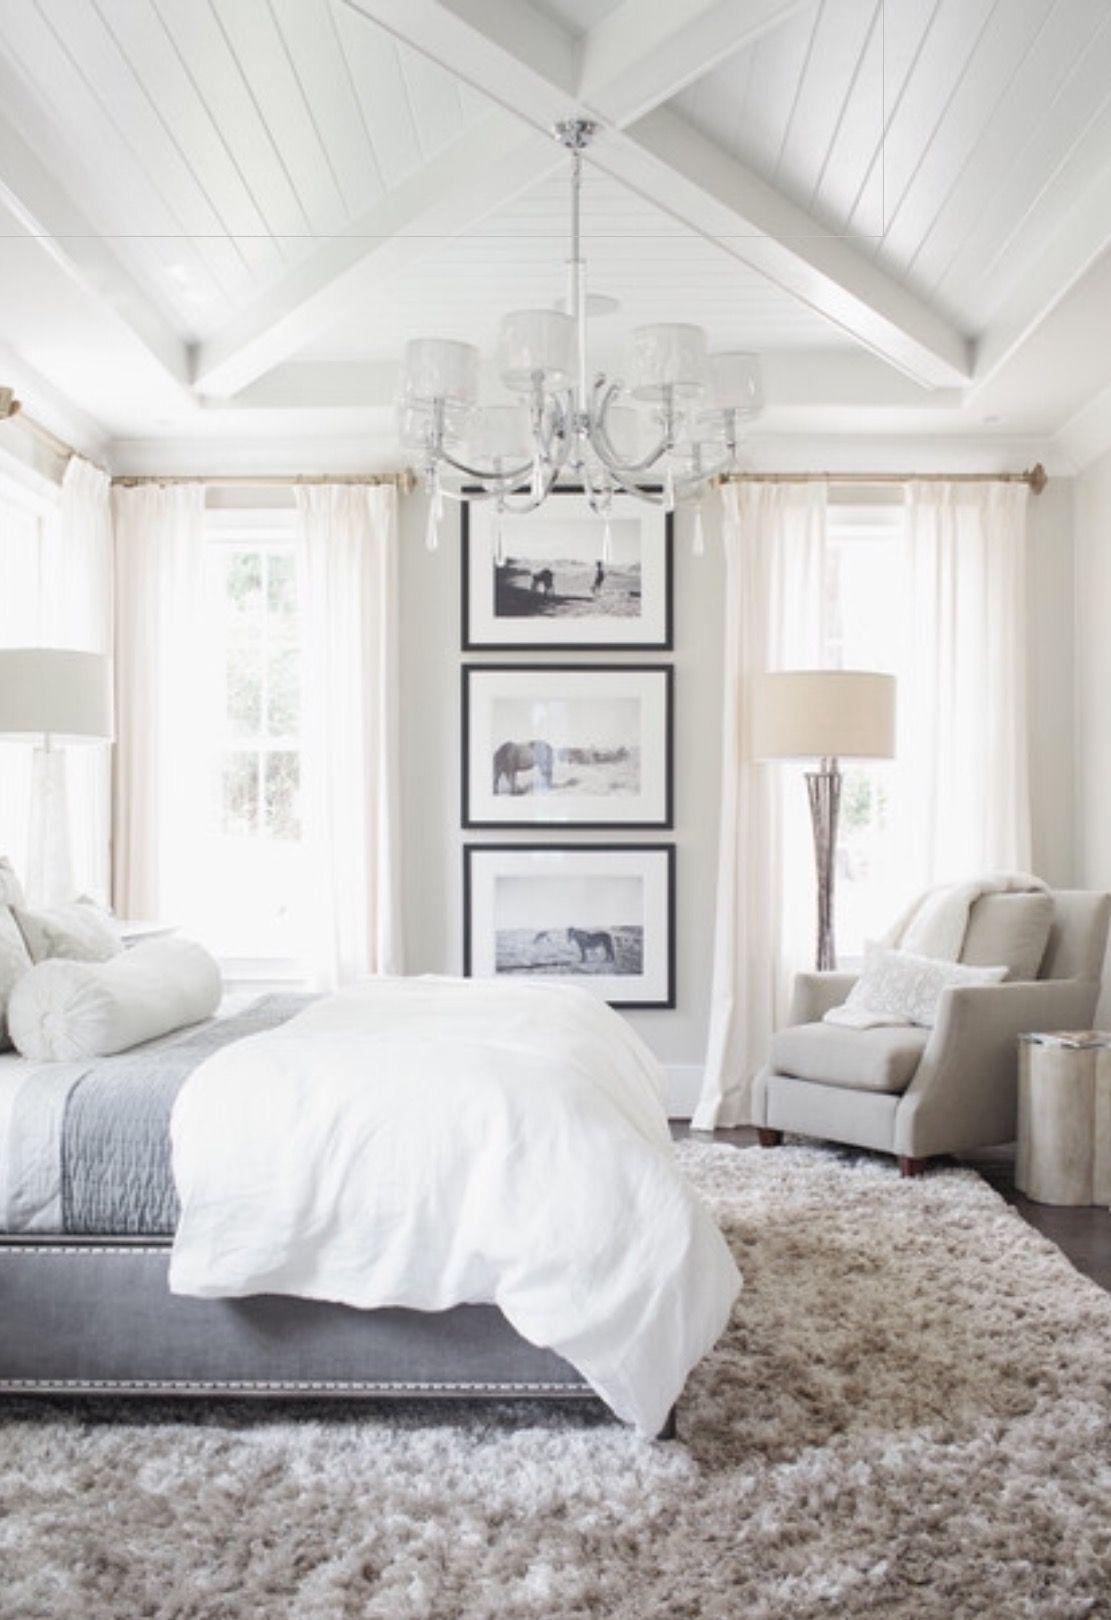 I like the frames between the windows look | Bedrooms | Pinterest ...